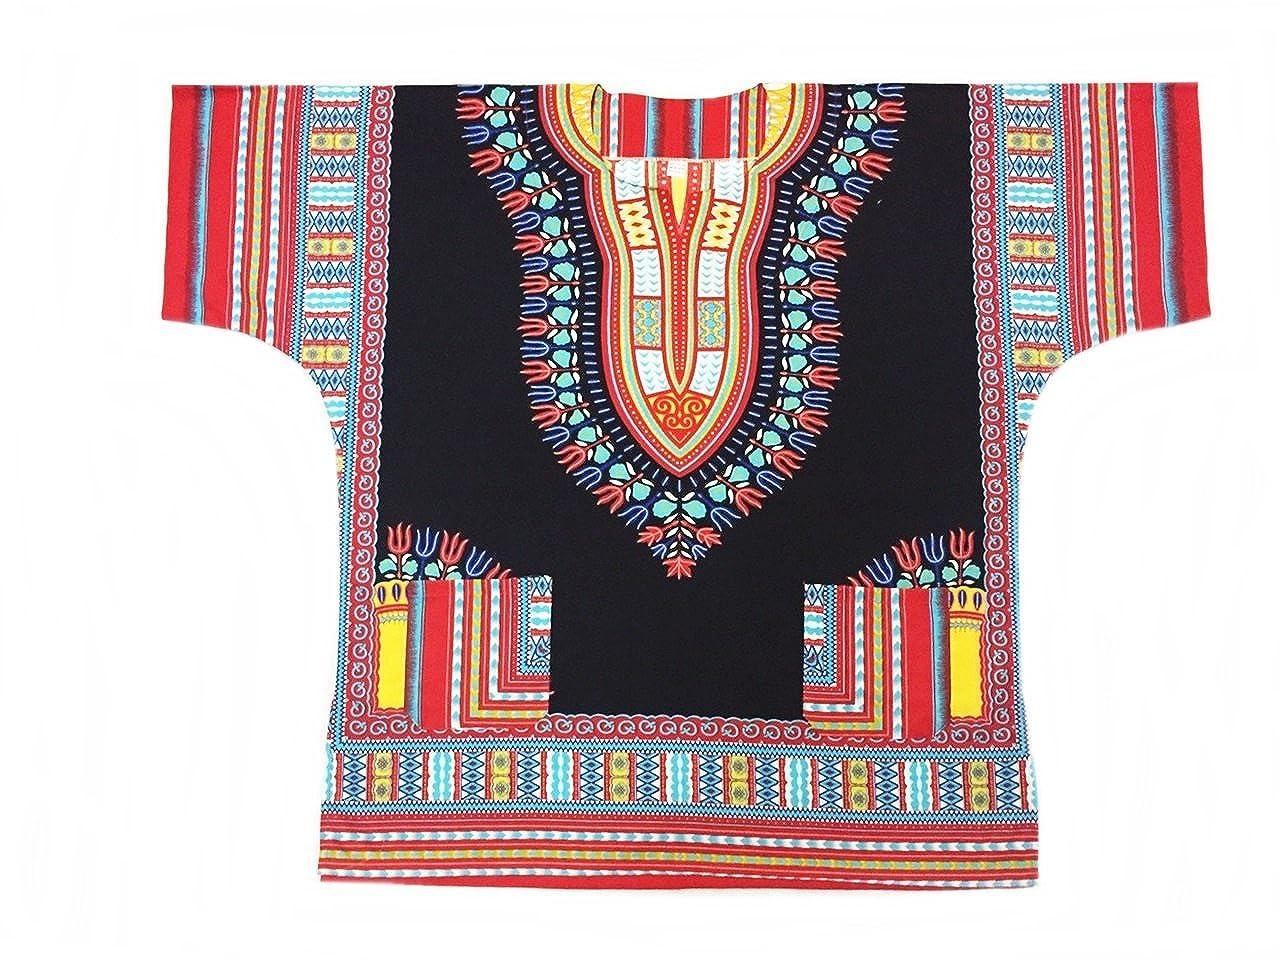 Vipada Handmade Dashiki Shirt African Caftan Kaftan Angelina Print Several Colors t33